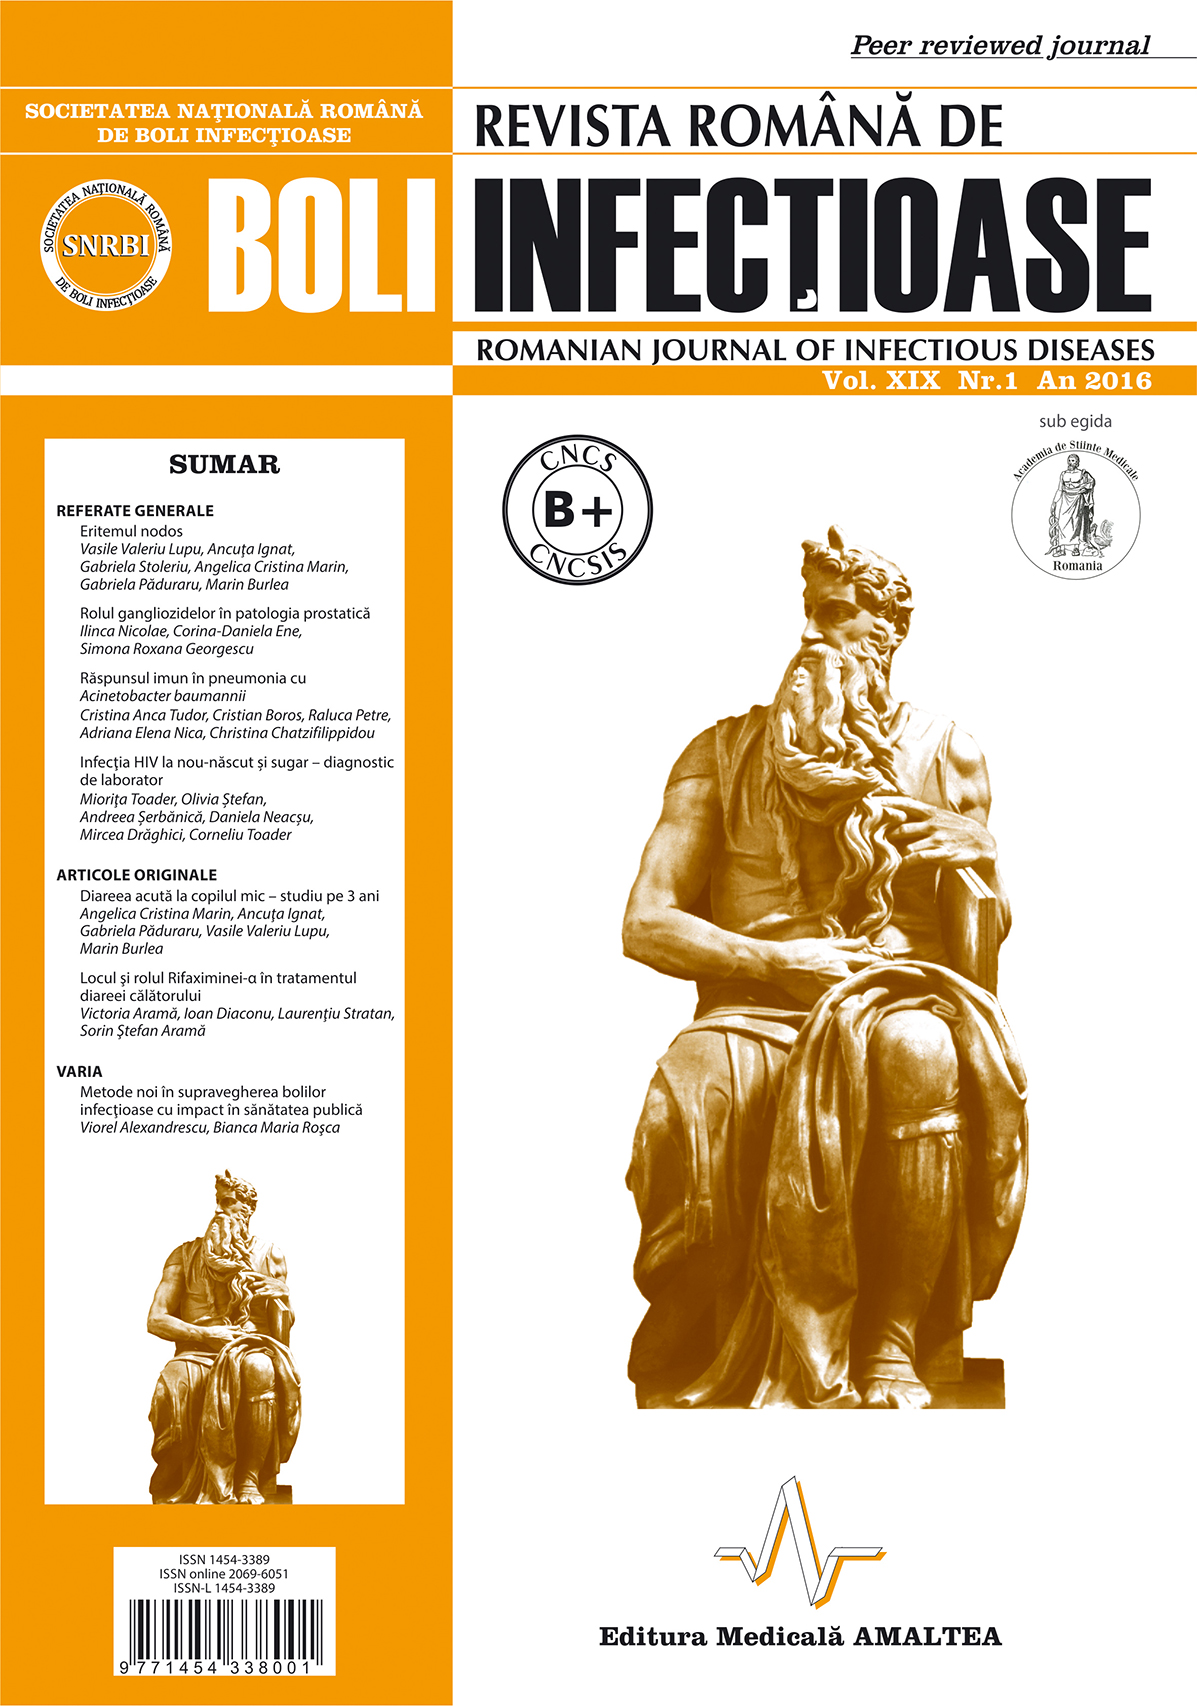 Revista Romana de Boli Infectioase | Vol. XIX, No. 1, 2016